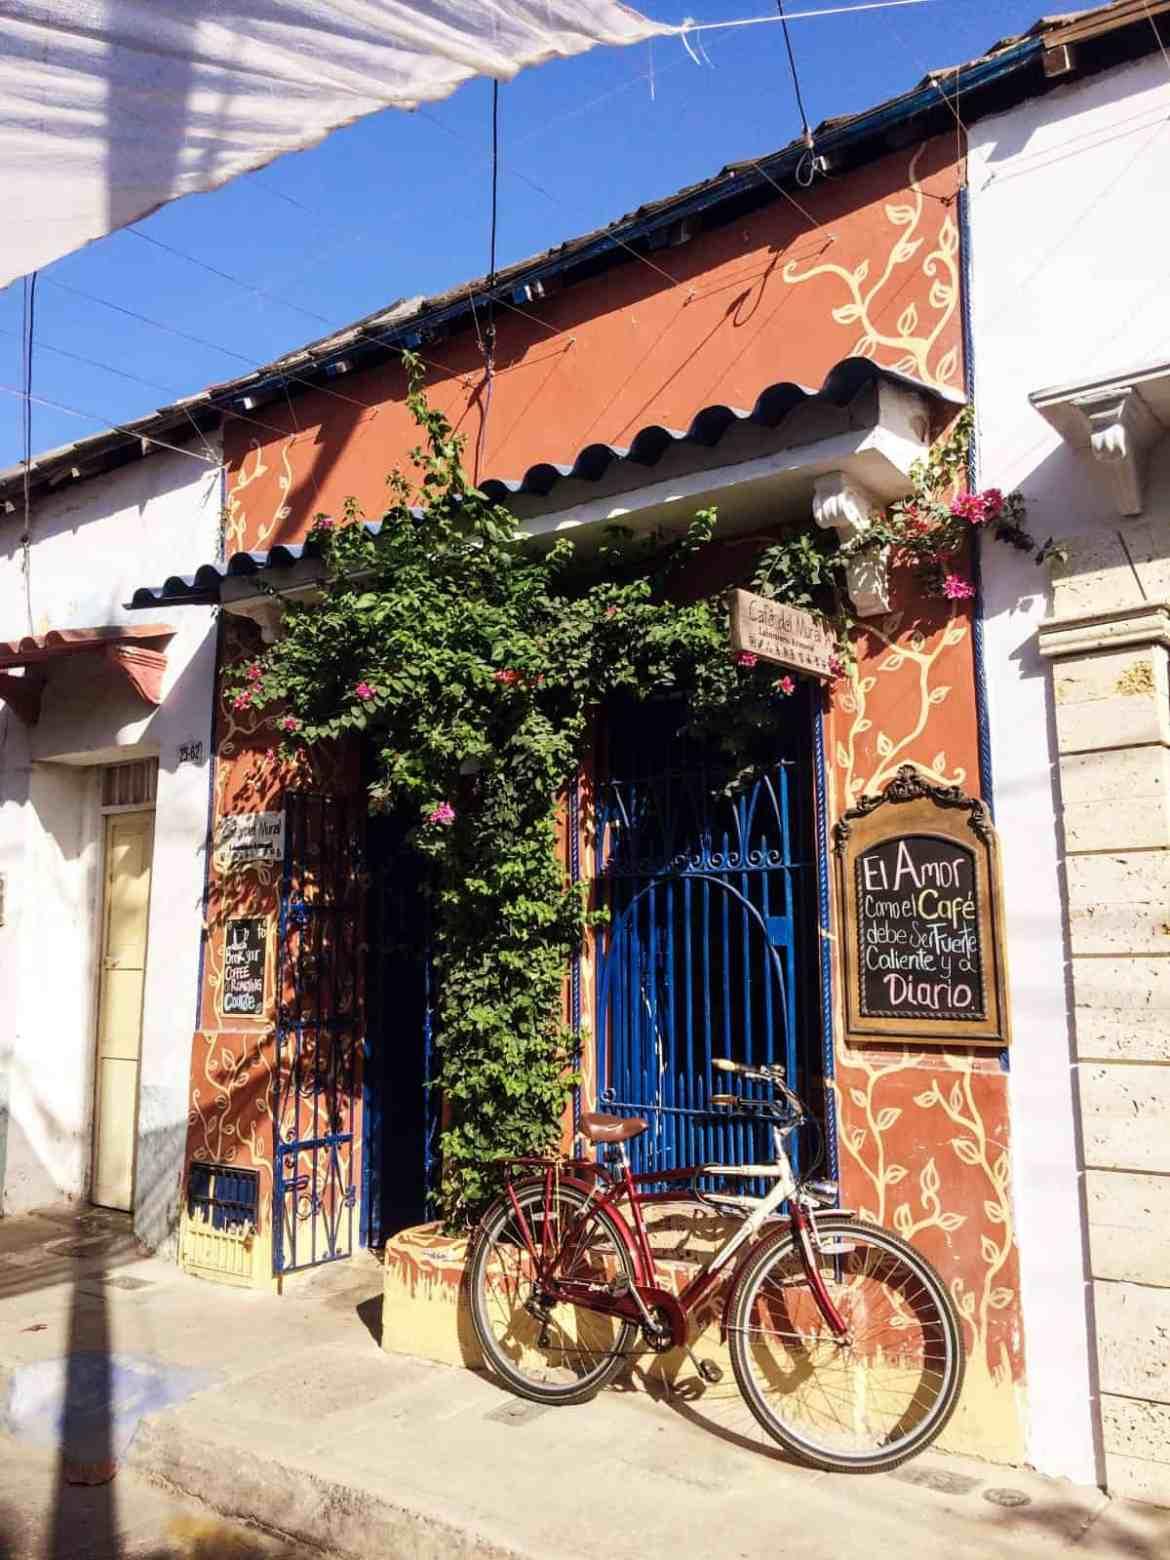 Café El Amor